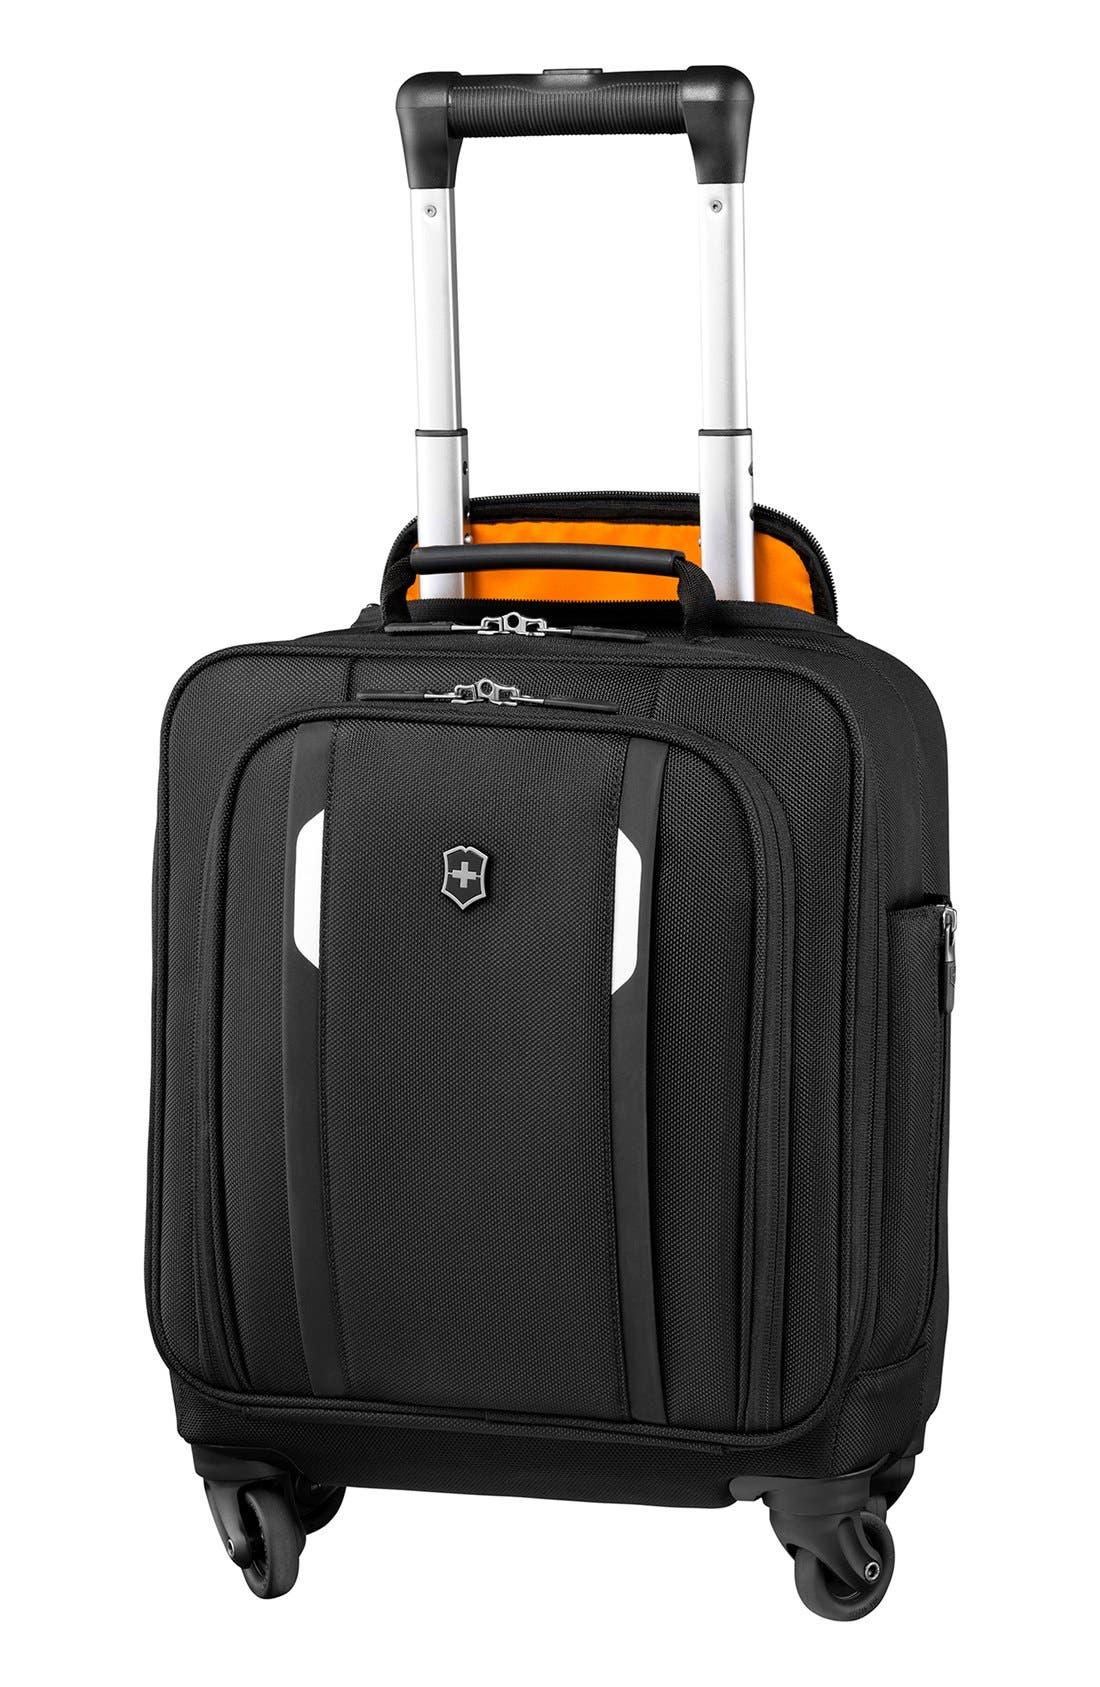 Main Image - Victorinox Swiss Army® WT 5.0 Wheeled Tote Bag